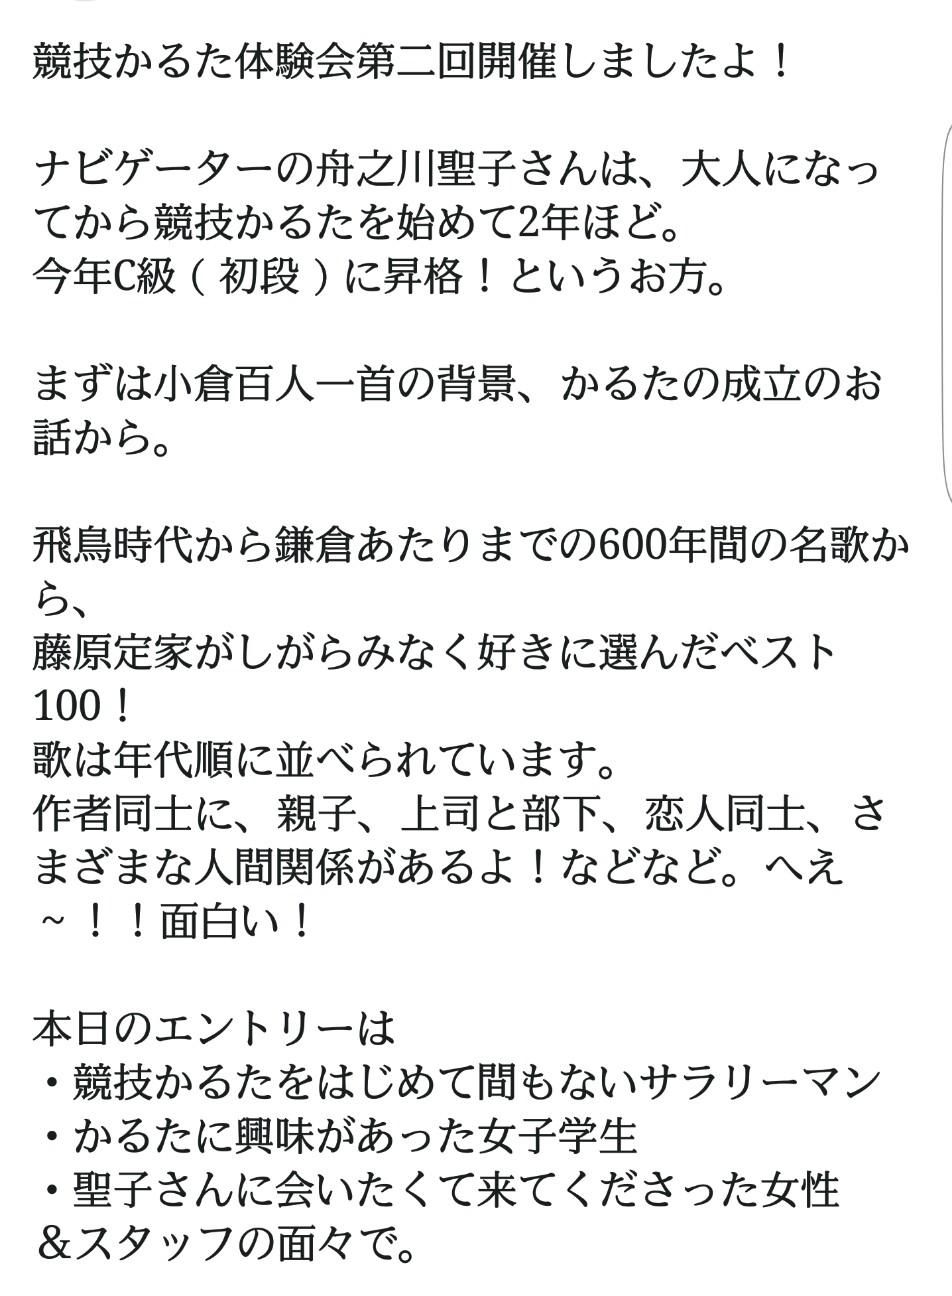 f:id:hitotobi:20190224104102j:image